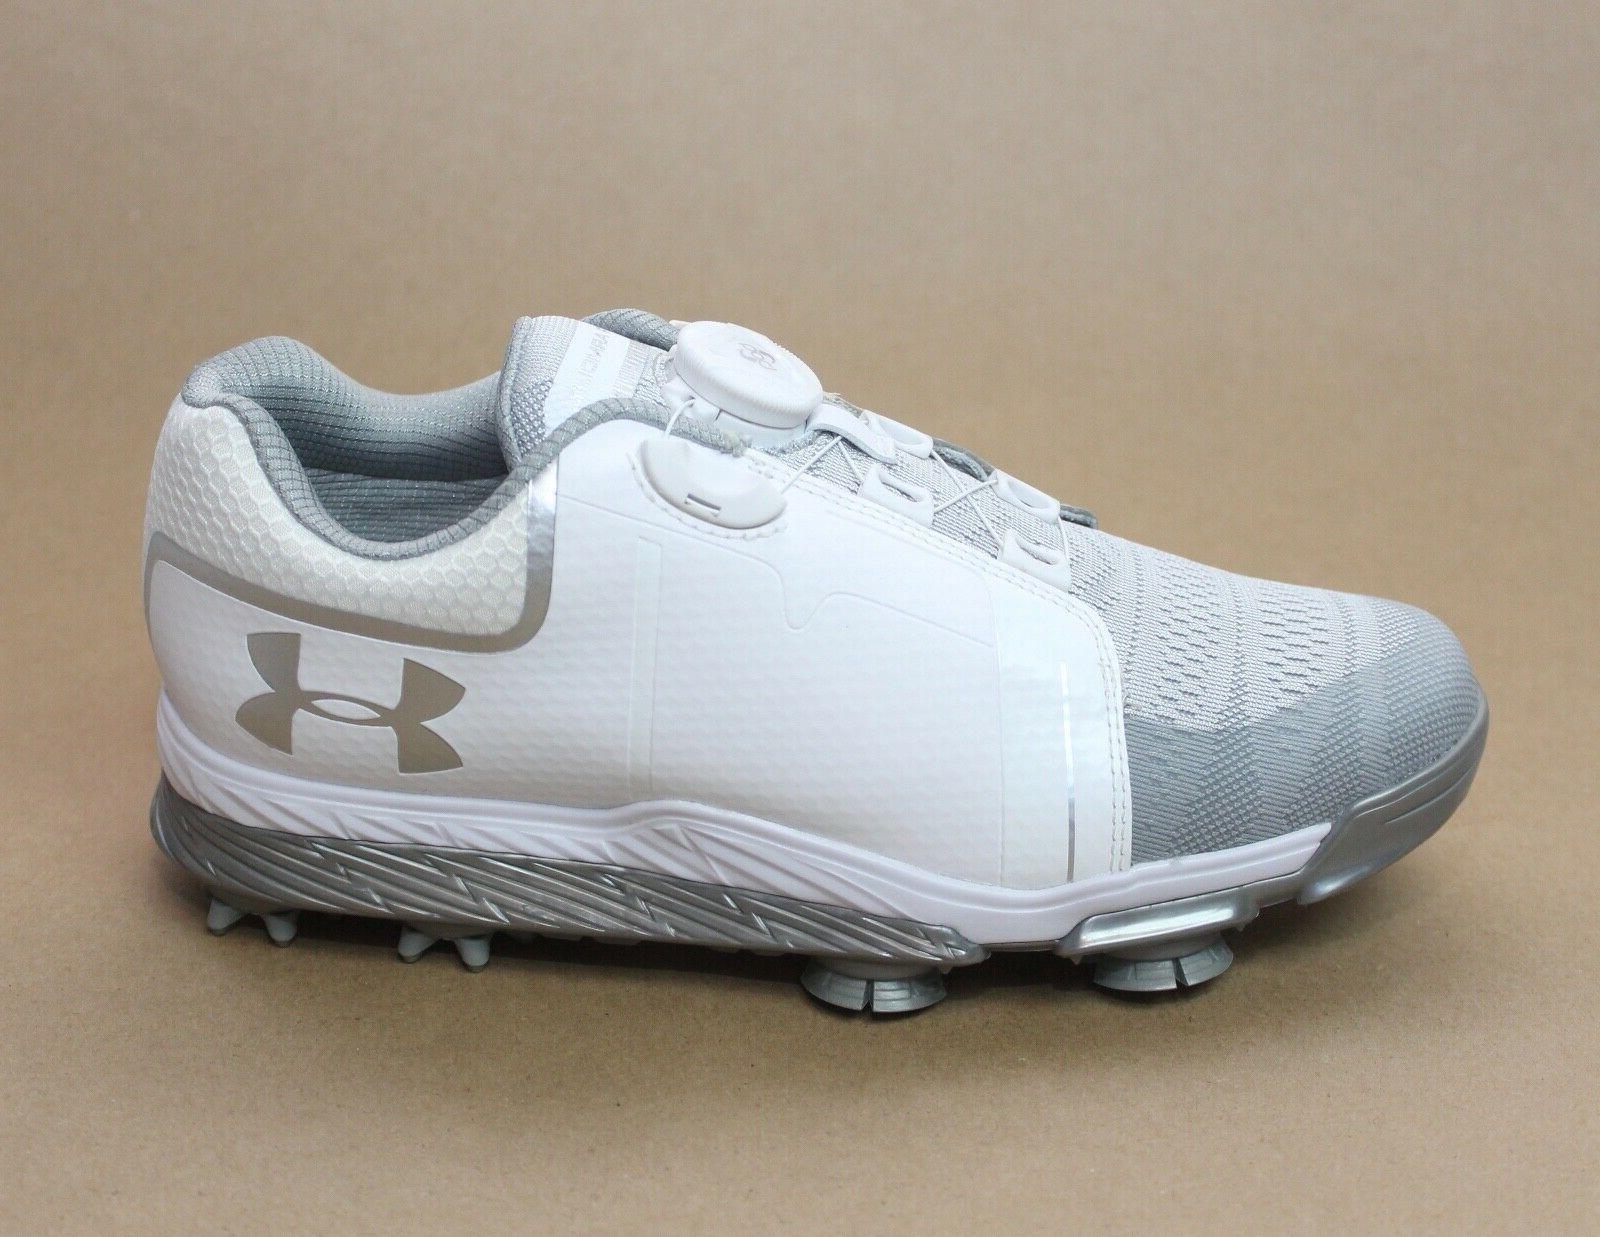 Under Armour Women's UA W Tempo Golf Shoes White Size